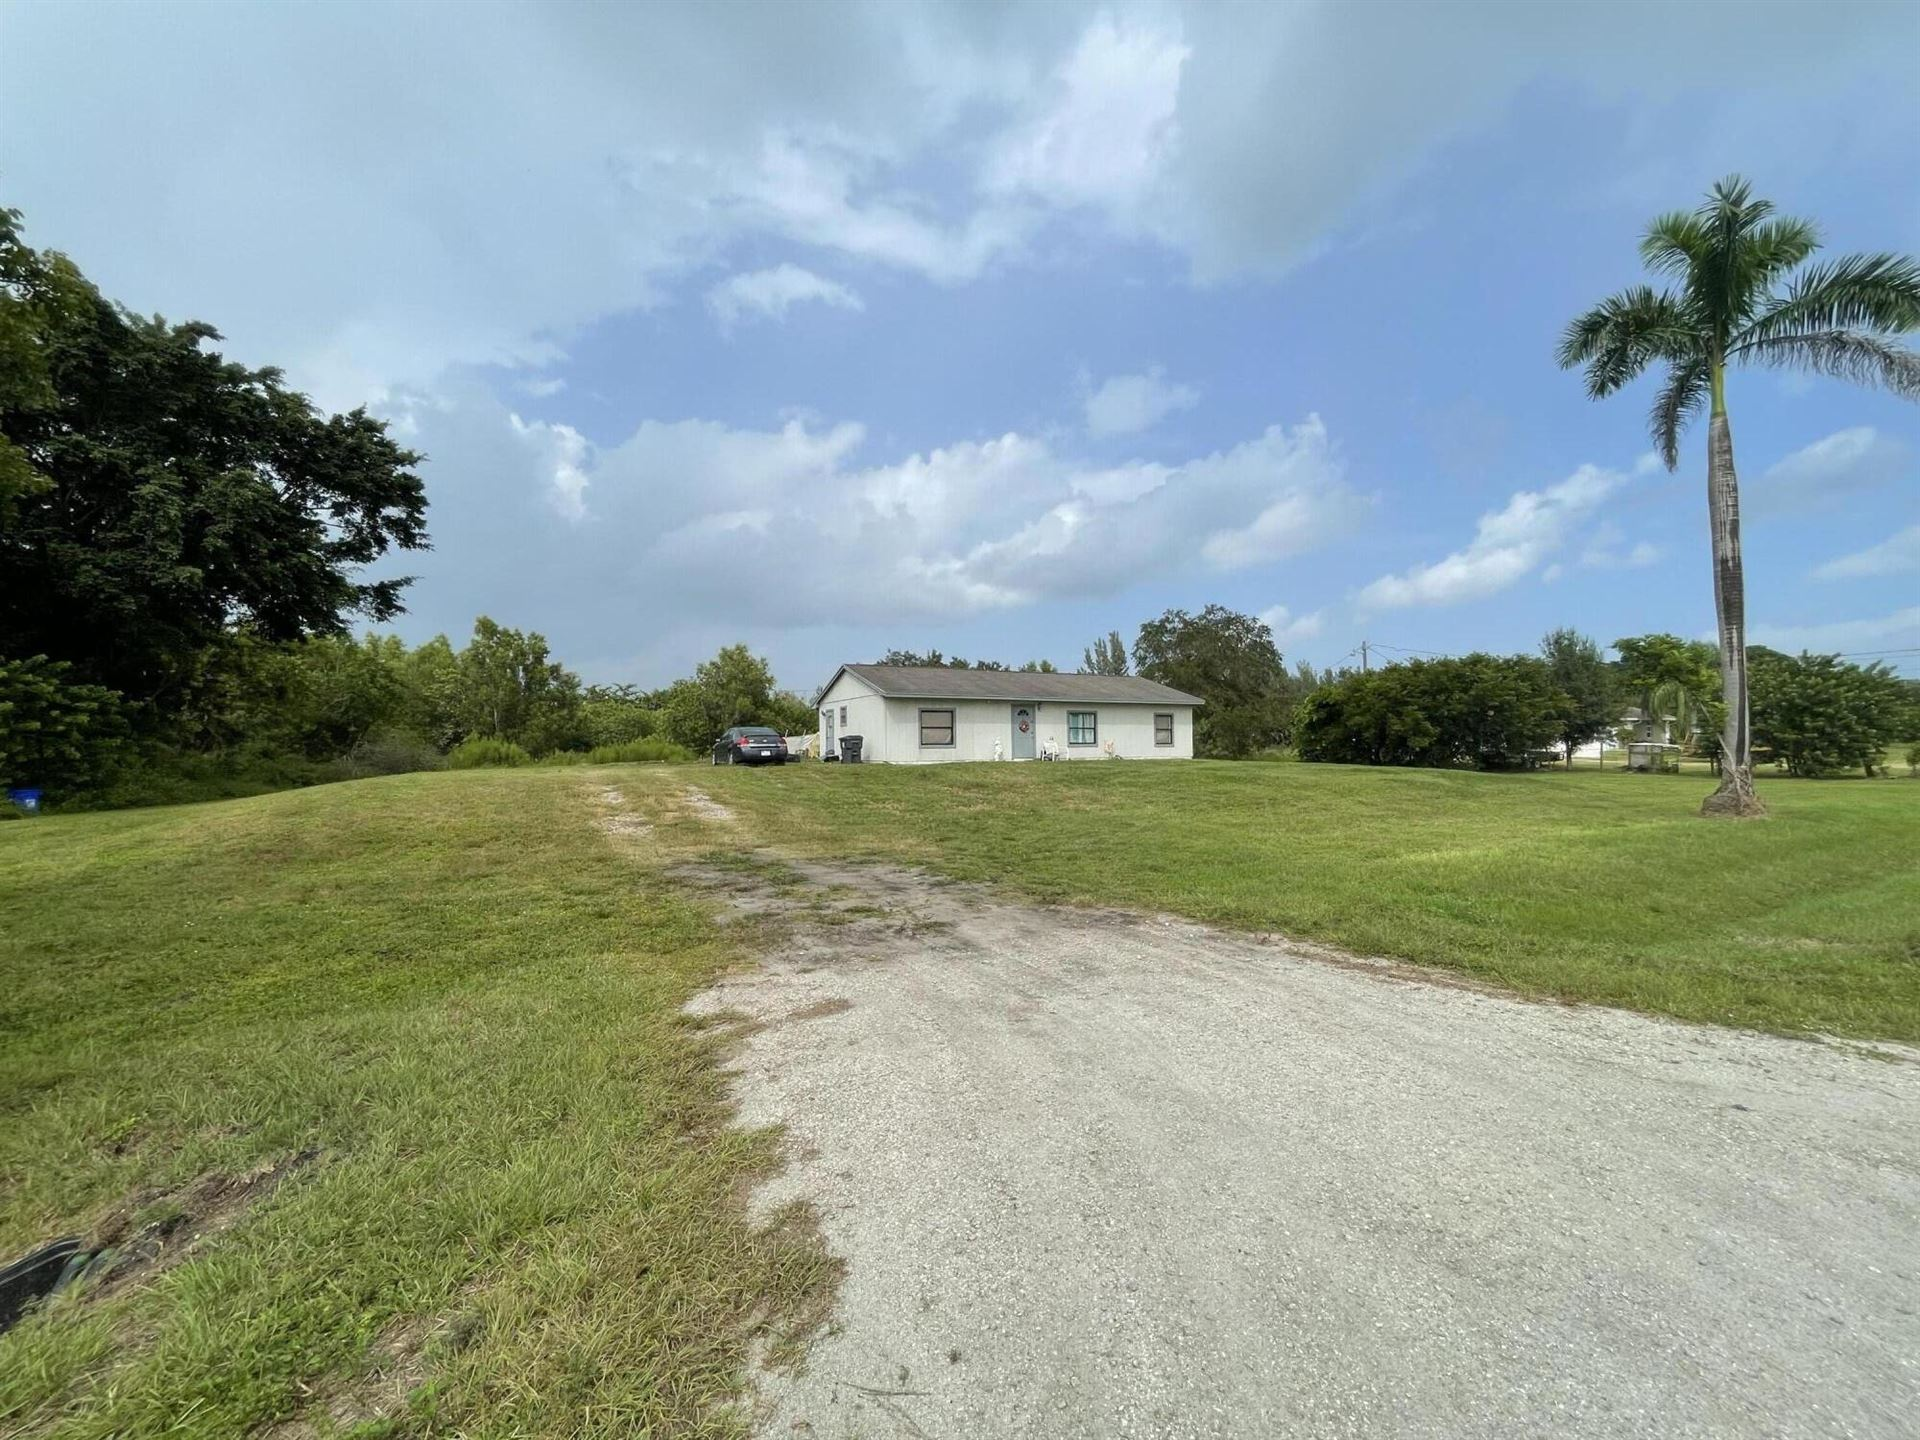 17845 38th Lane N, Loxahatchee, FL 33470 - MLS#: RX-10750666